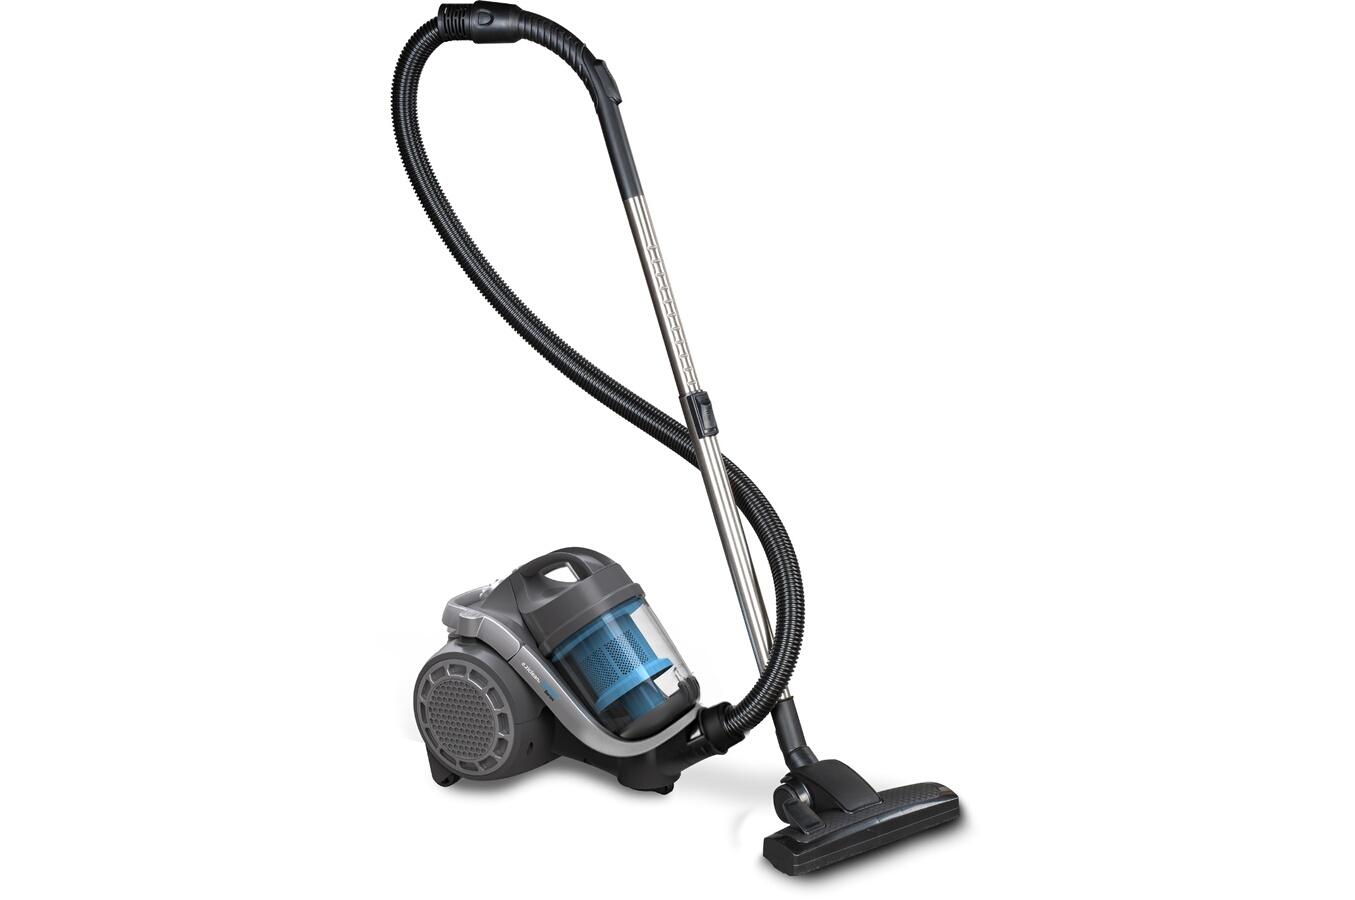 aspirateur sans sac eziclean turbo one aspirateur sans sac multi cyclonique turbo. Black Bedroom Furniture Sets. Home Design Ideas